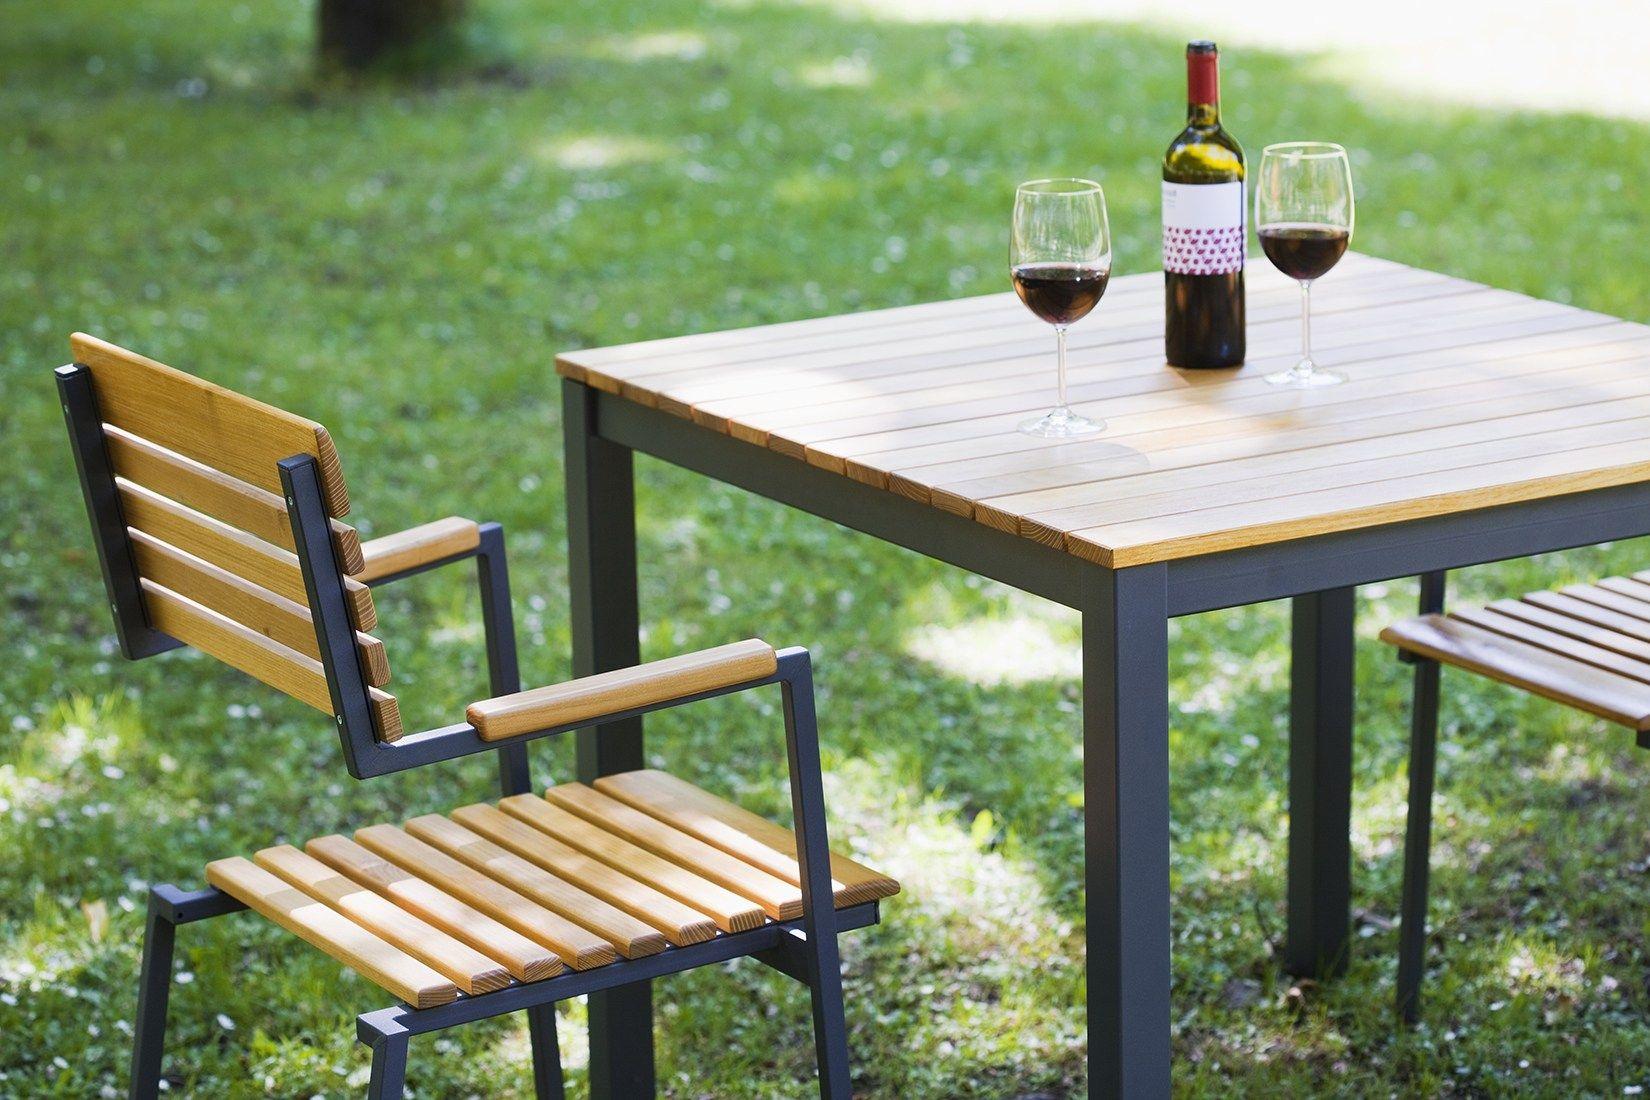 Cool Turbo Robin Garden Table By Sixay Furniture Design Lszl Szikszai Nz  With Gartentisch Eckig Holz